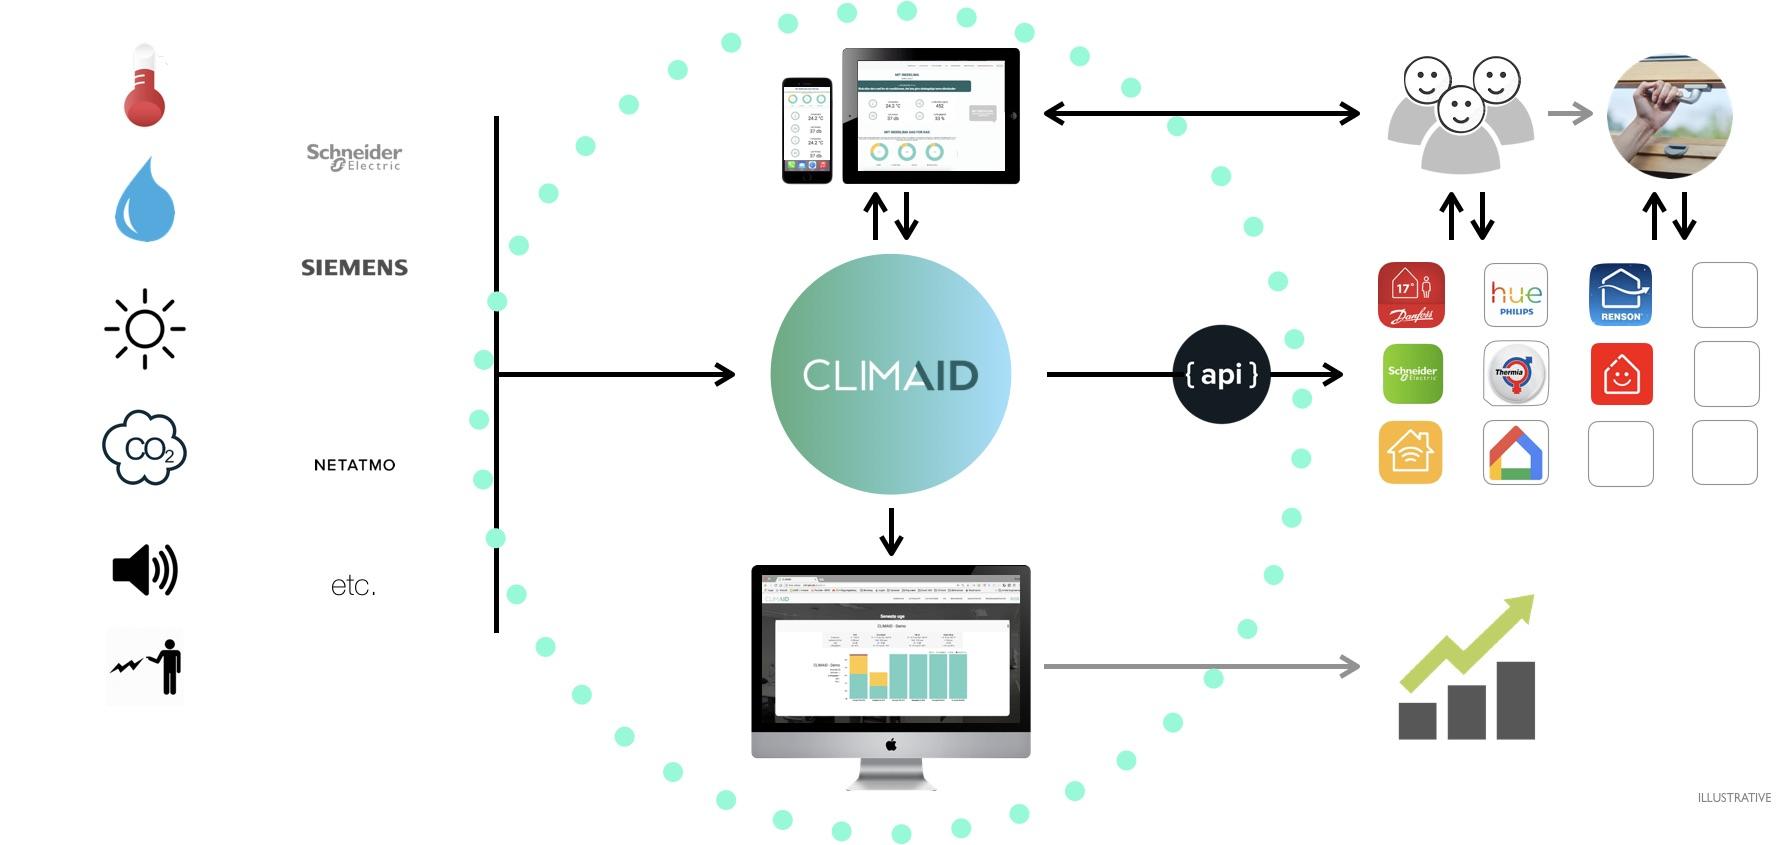 Climaid eco-system.jpg